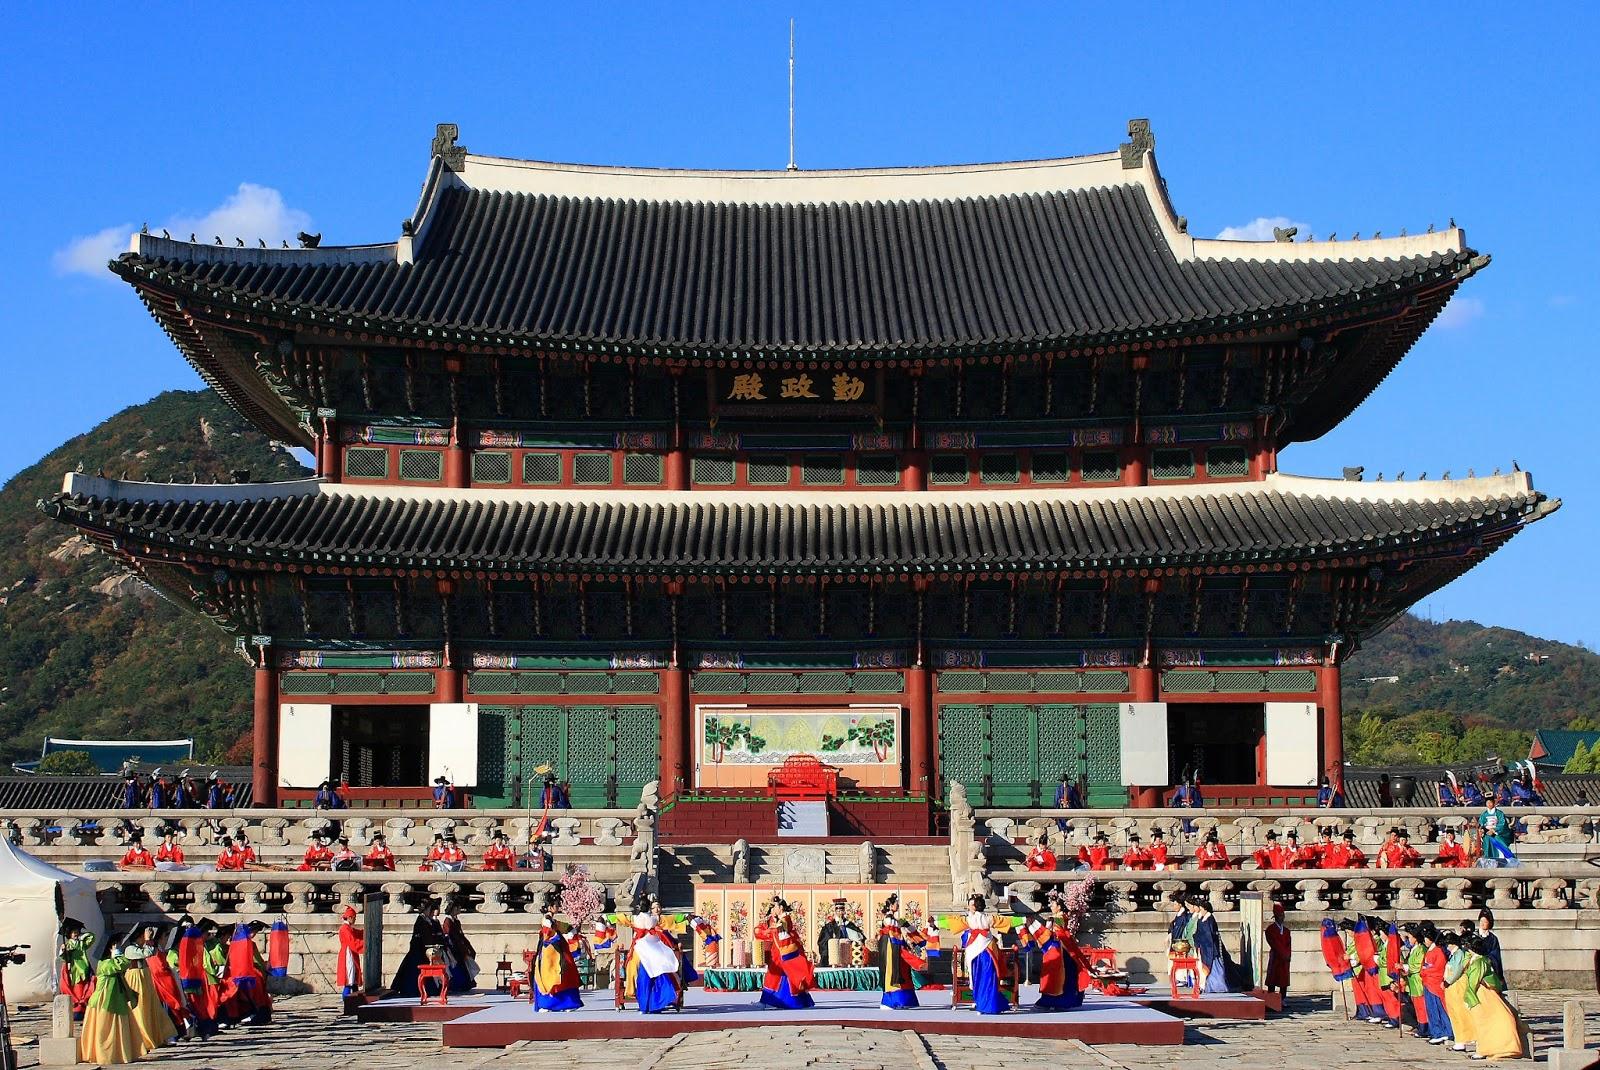 Enjoy Korea Jeju Island Ski Resort 6d 4n Nusantara Wisata Paket Special Fun Dewasa Akomodasi Palace Hotel Atau Setaraf